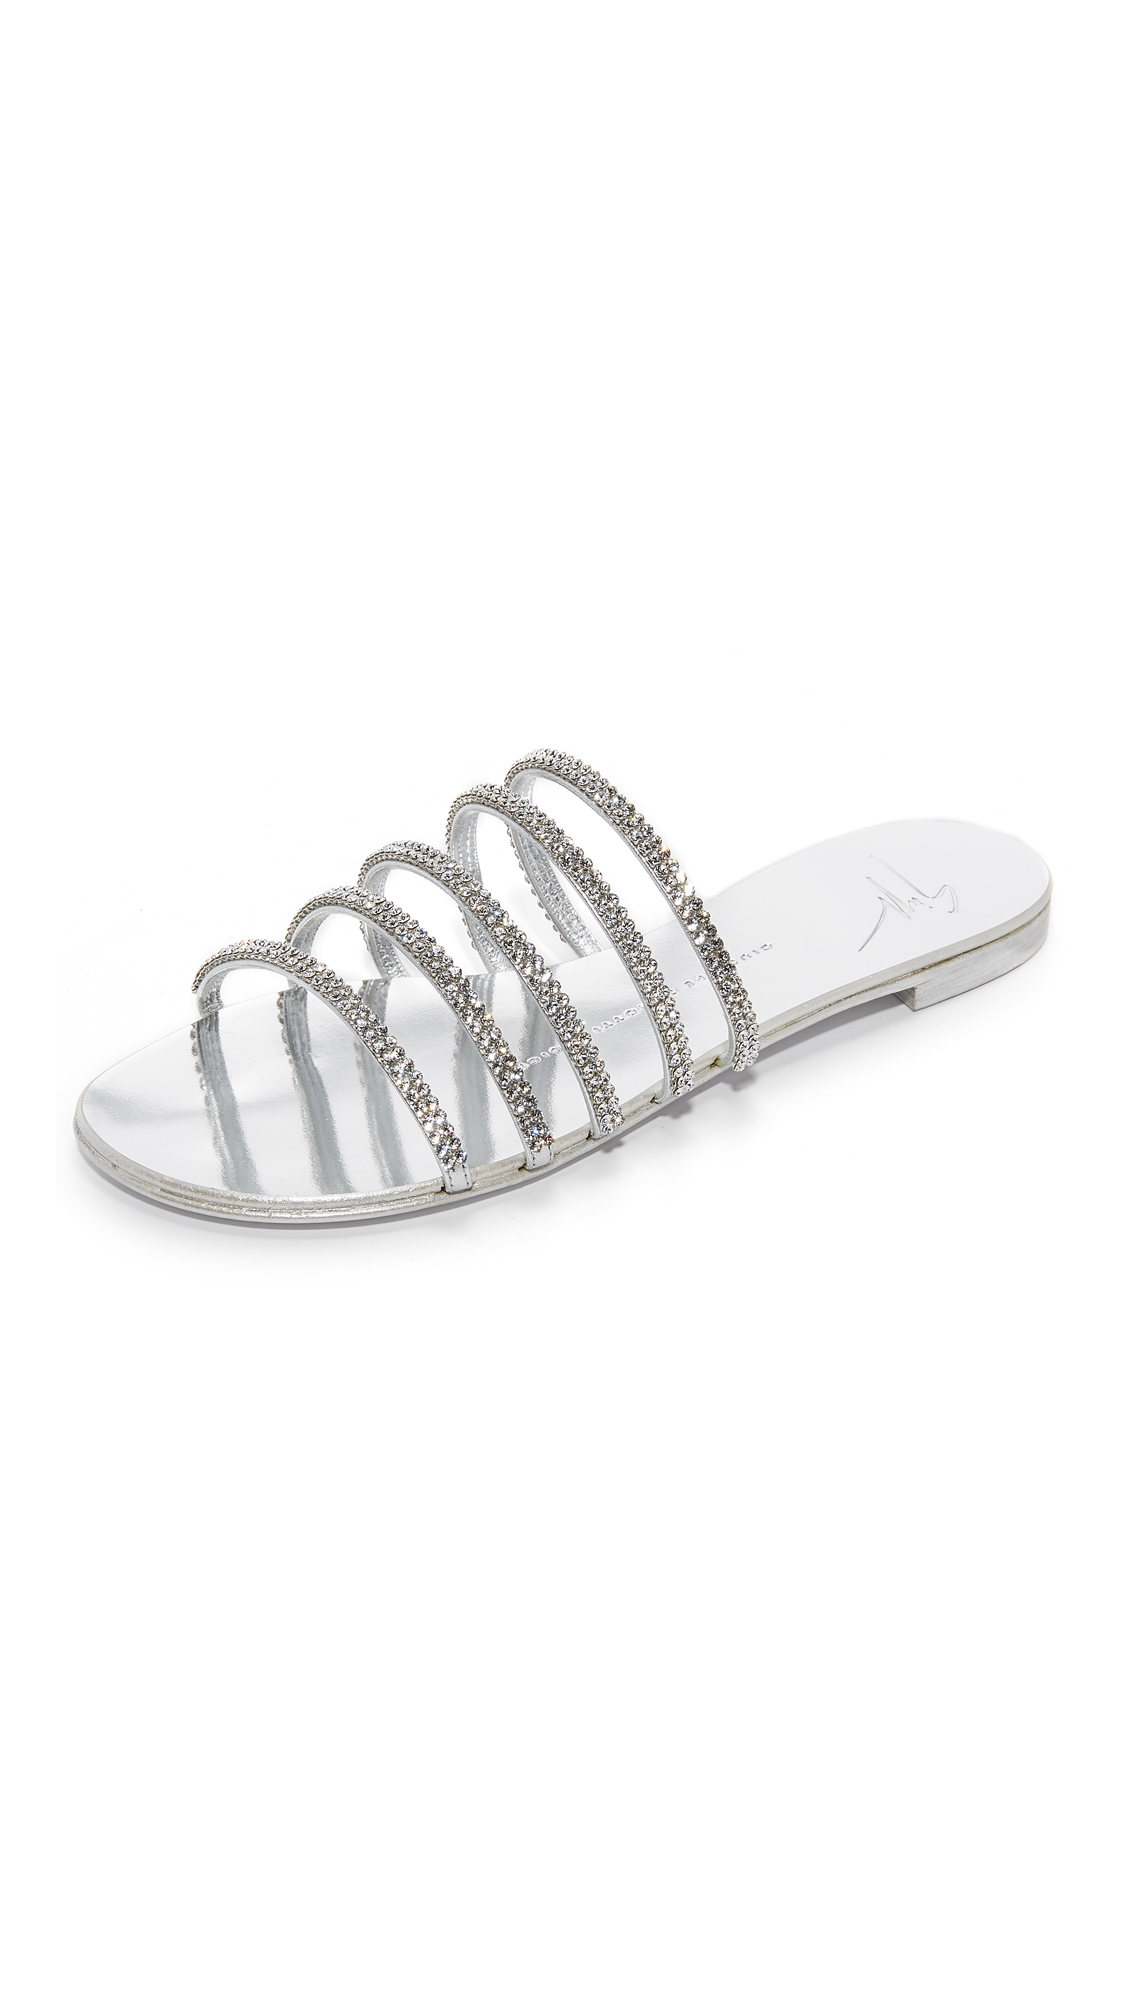 Giuseppe Zanotti Strappy Flat Sandals - Argento